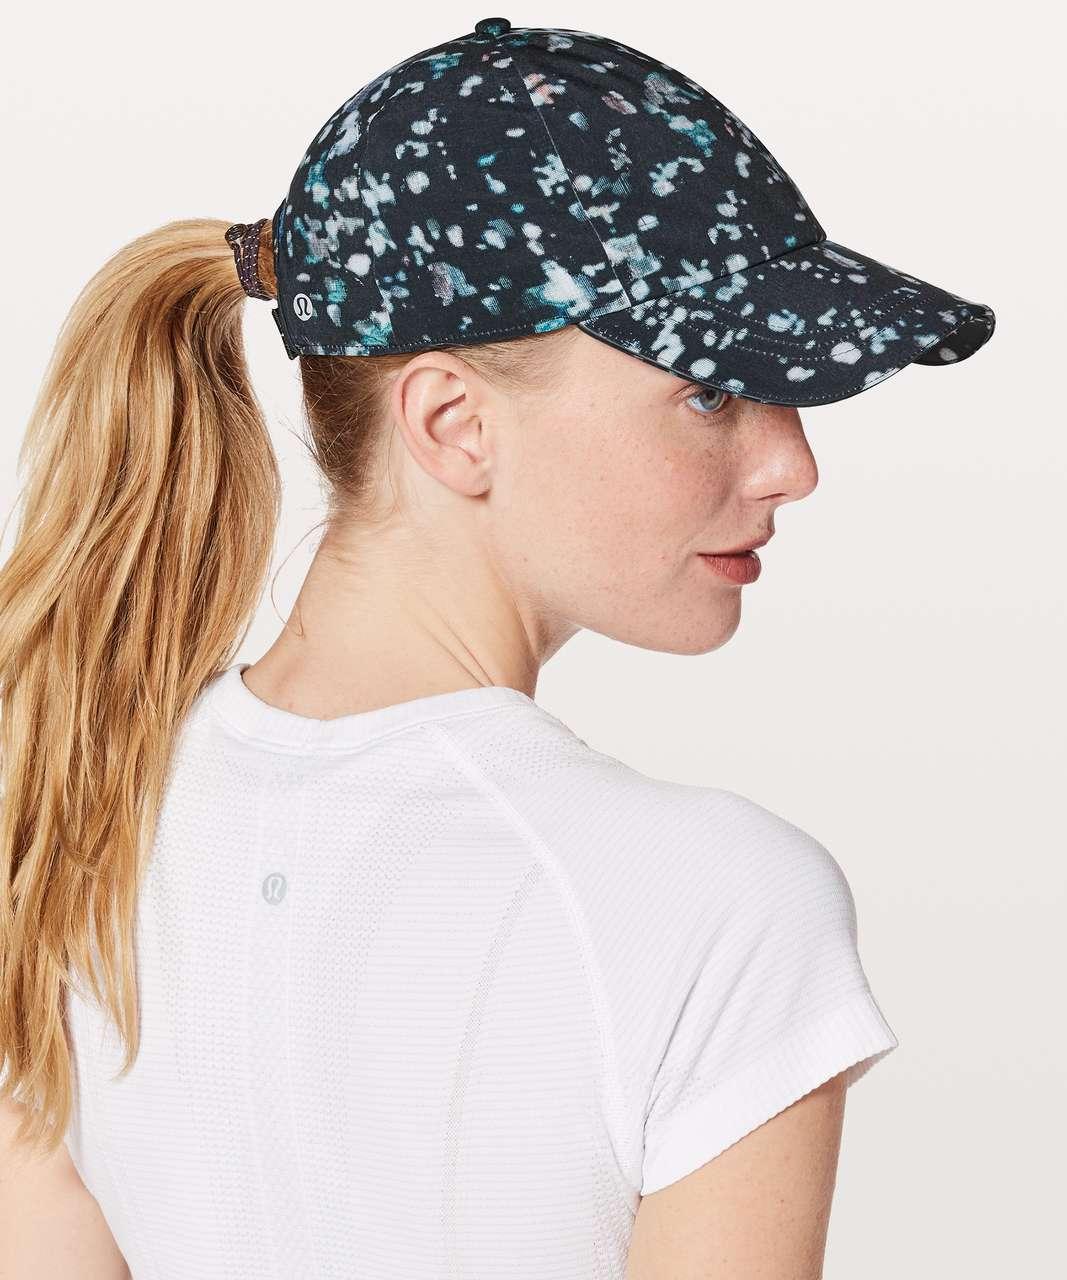 4e42e03897a07 Lululemon Baller Hat Run - Pixel Haze Multi Black - lulu fanatics